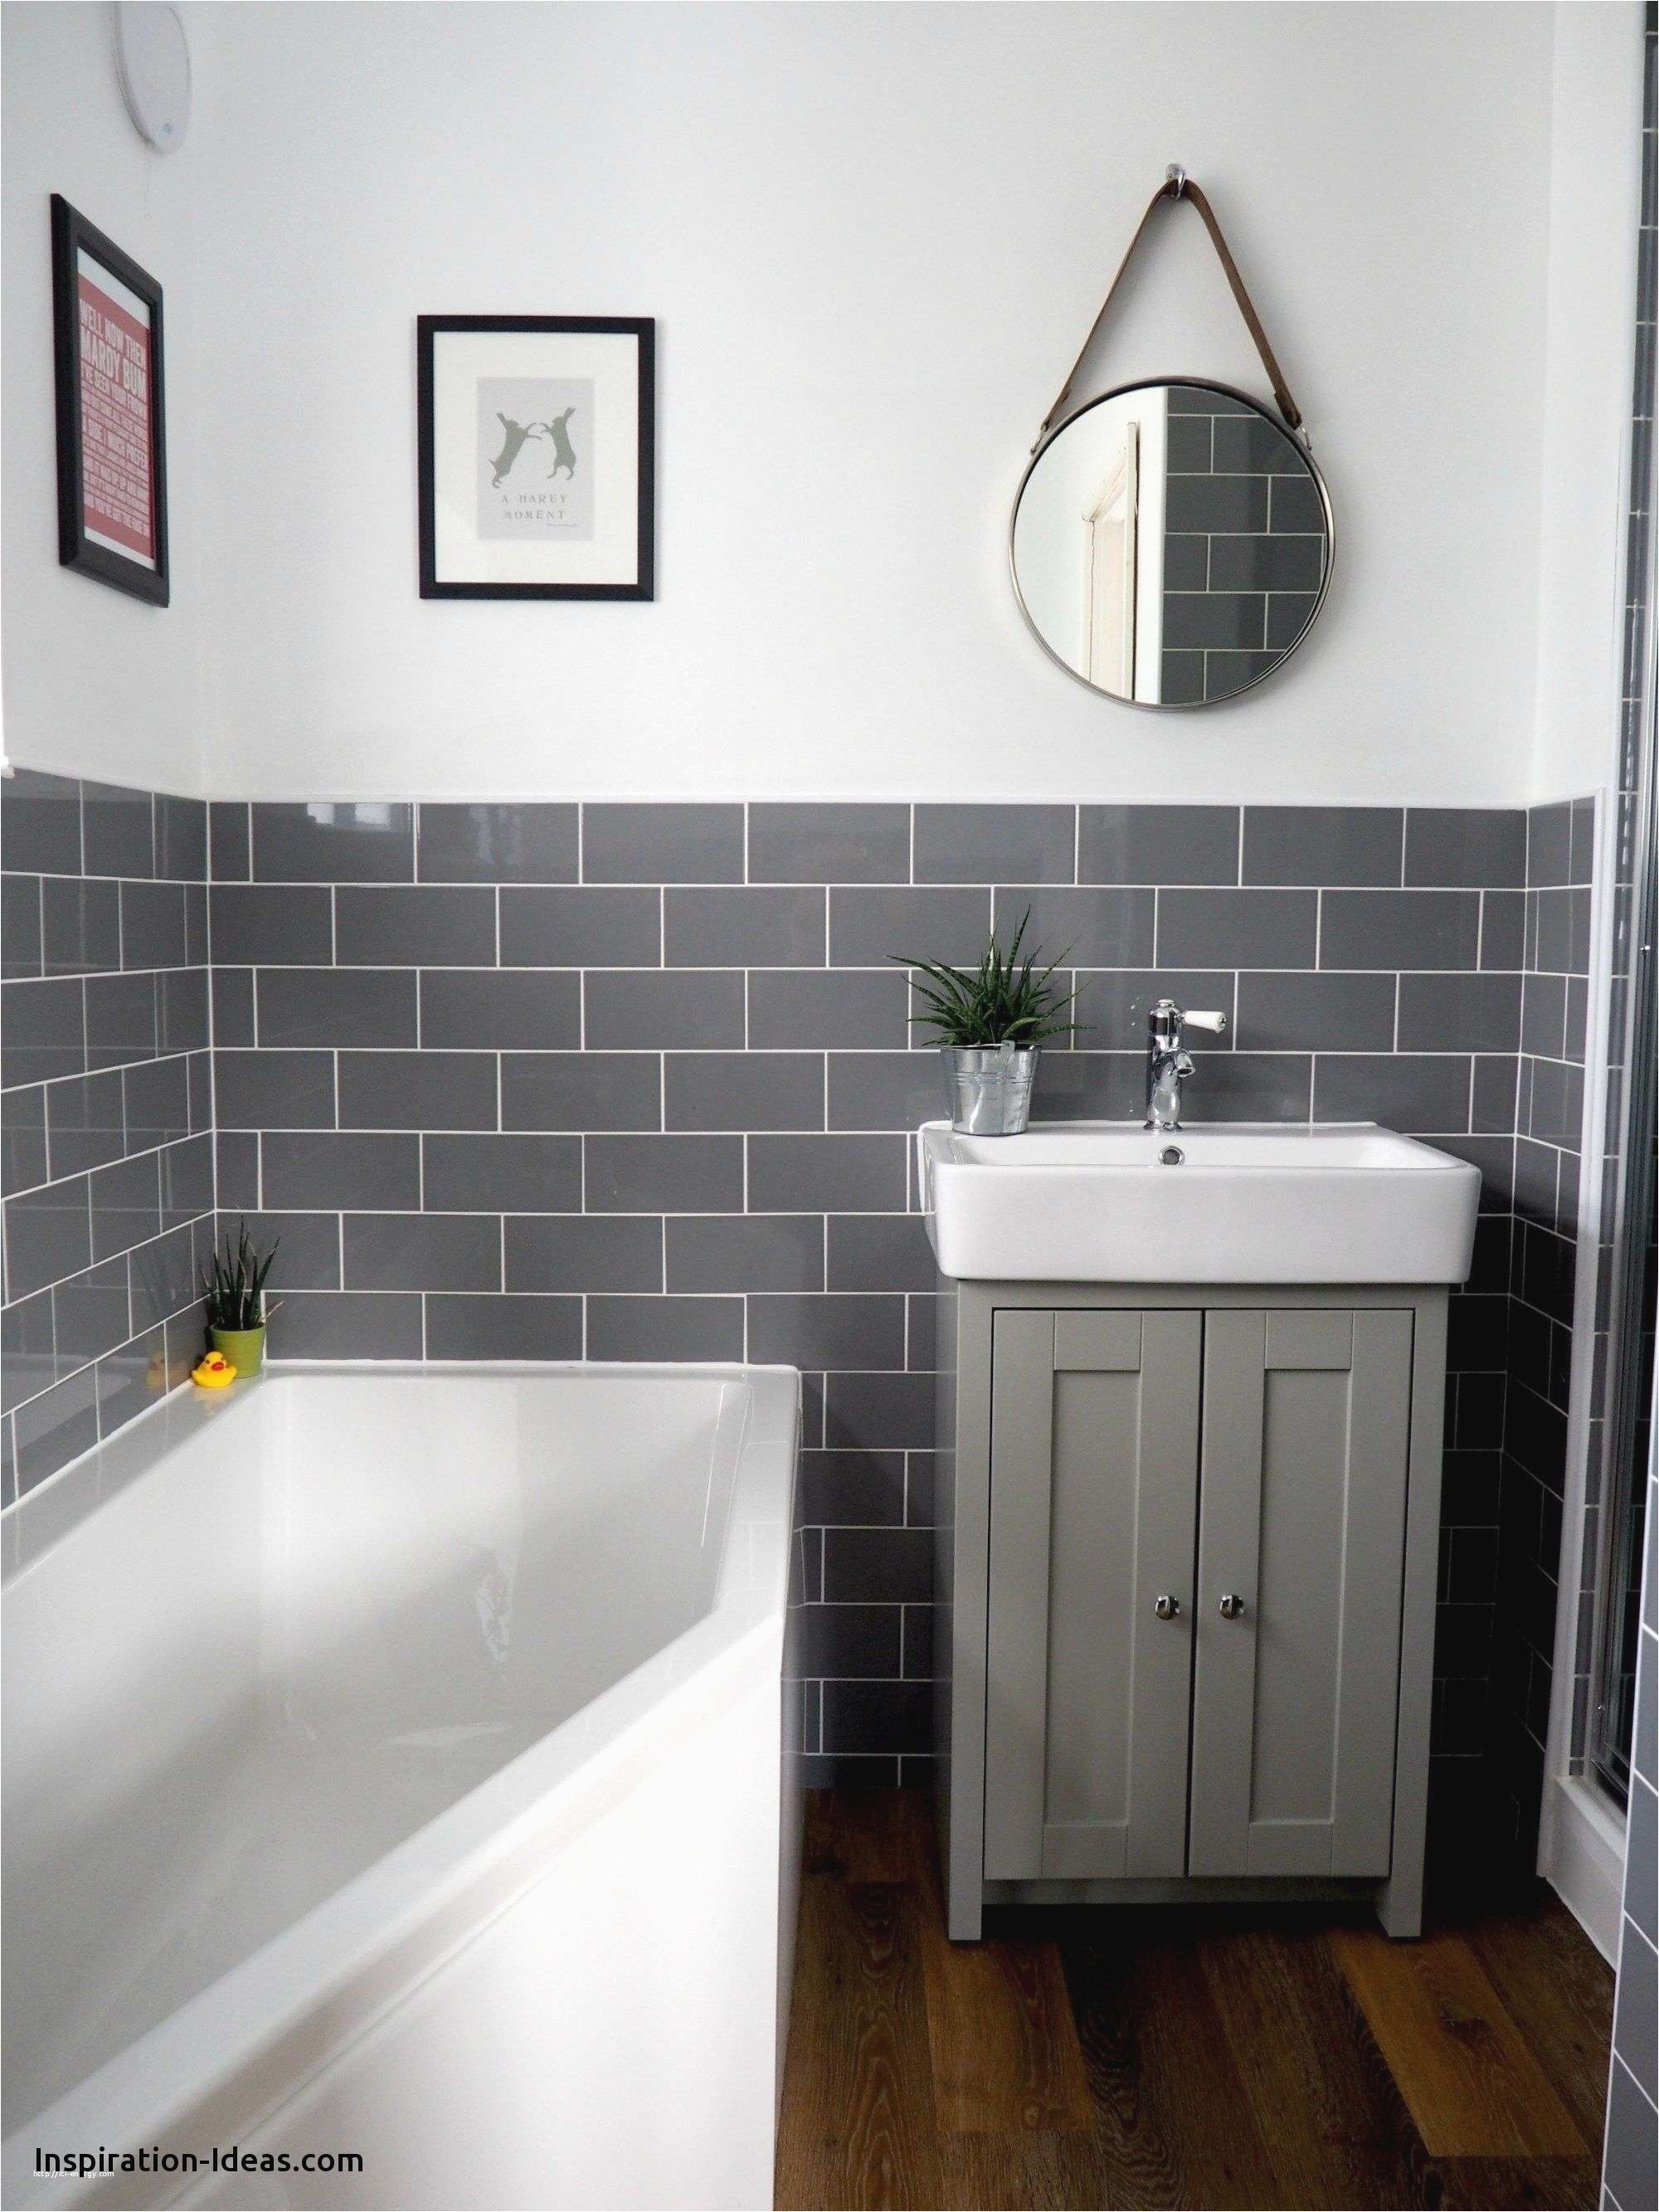 Bathroom Design Ideas Dublin 27 Bathroom Design Ideas Dublin norwin Home Design